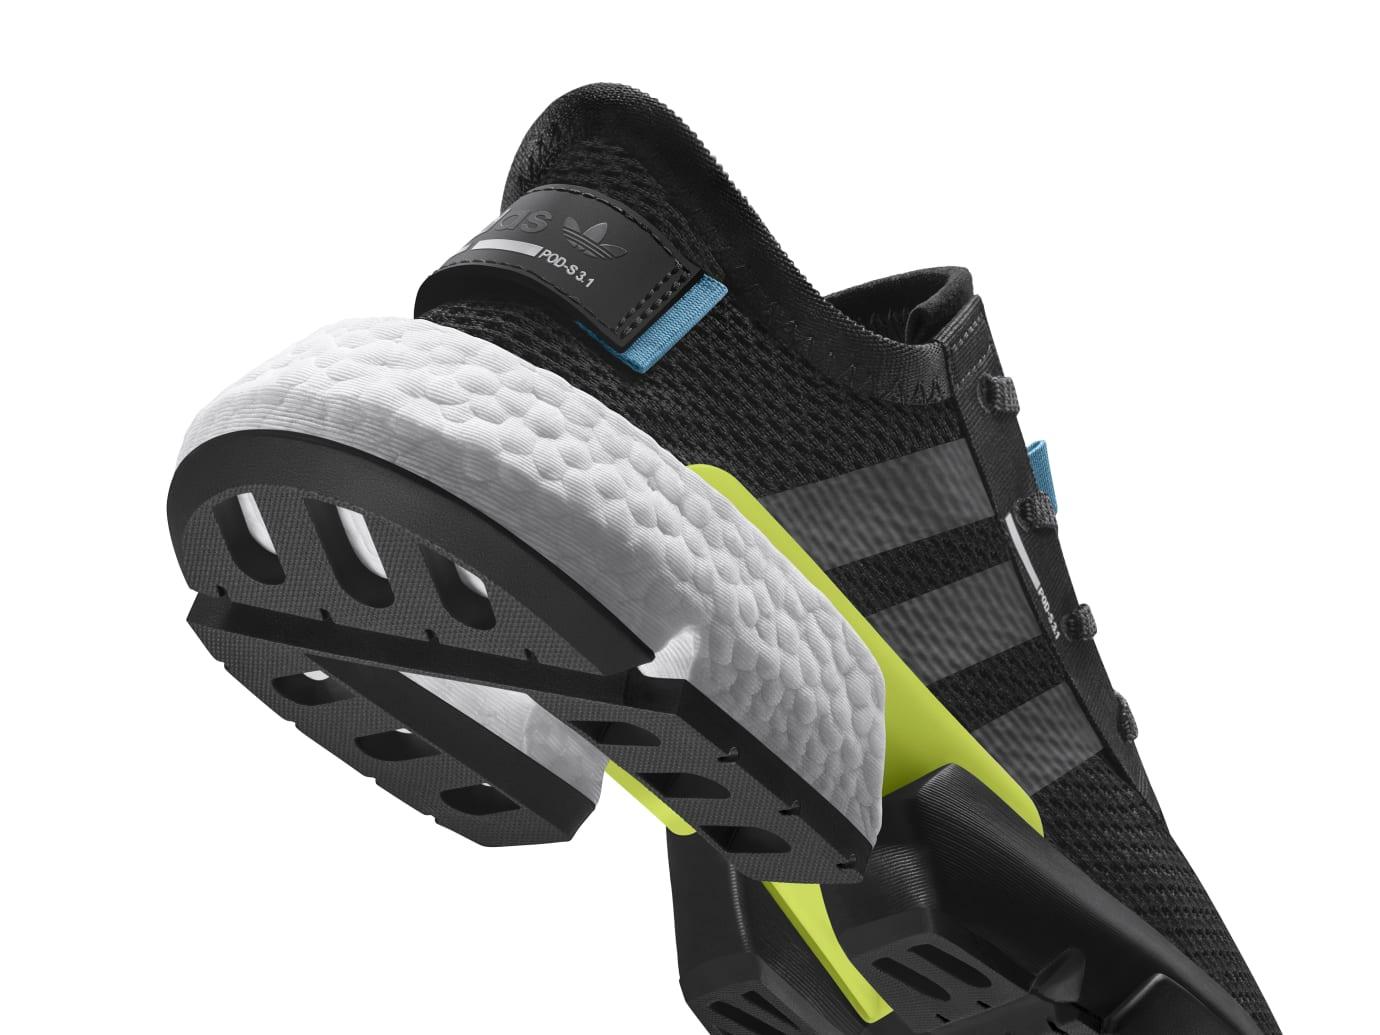 Adidas P.O.D. System AQ1059 (Heel)